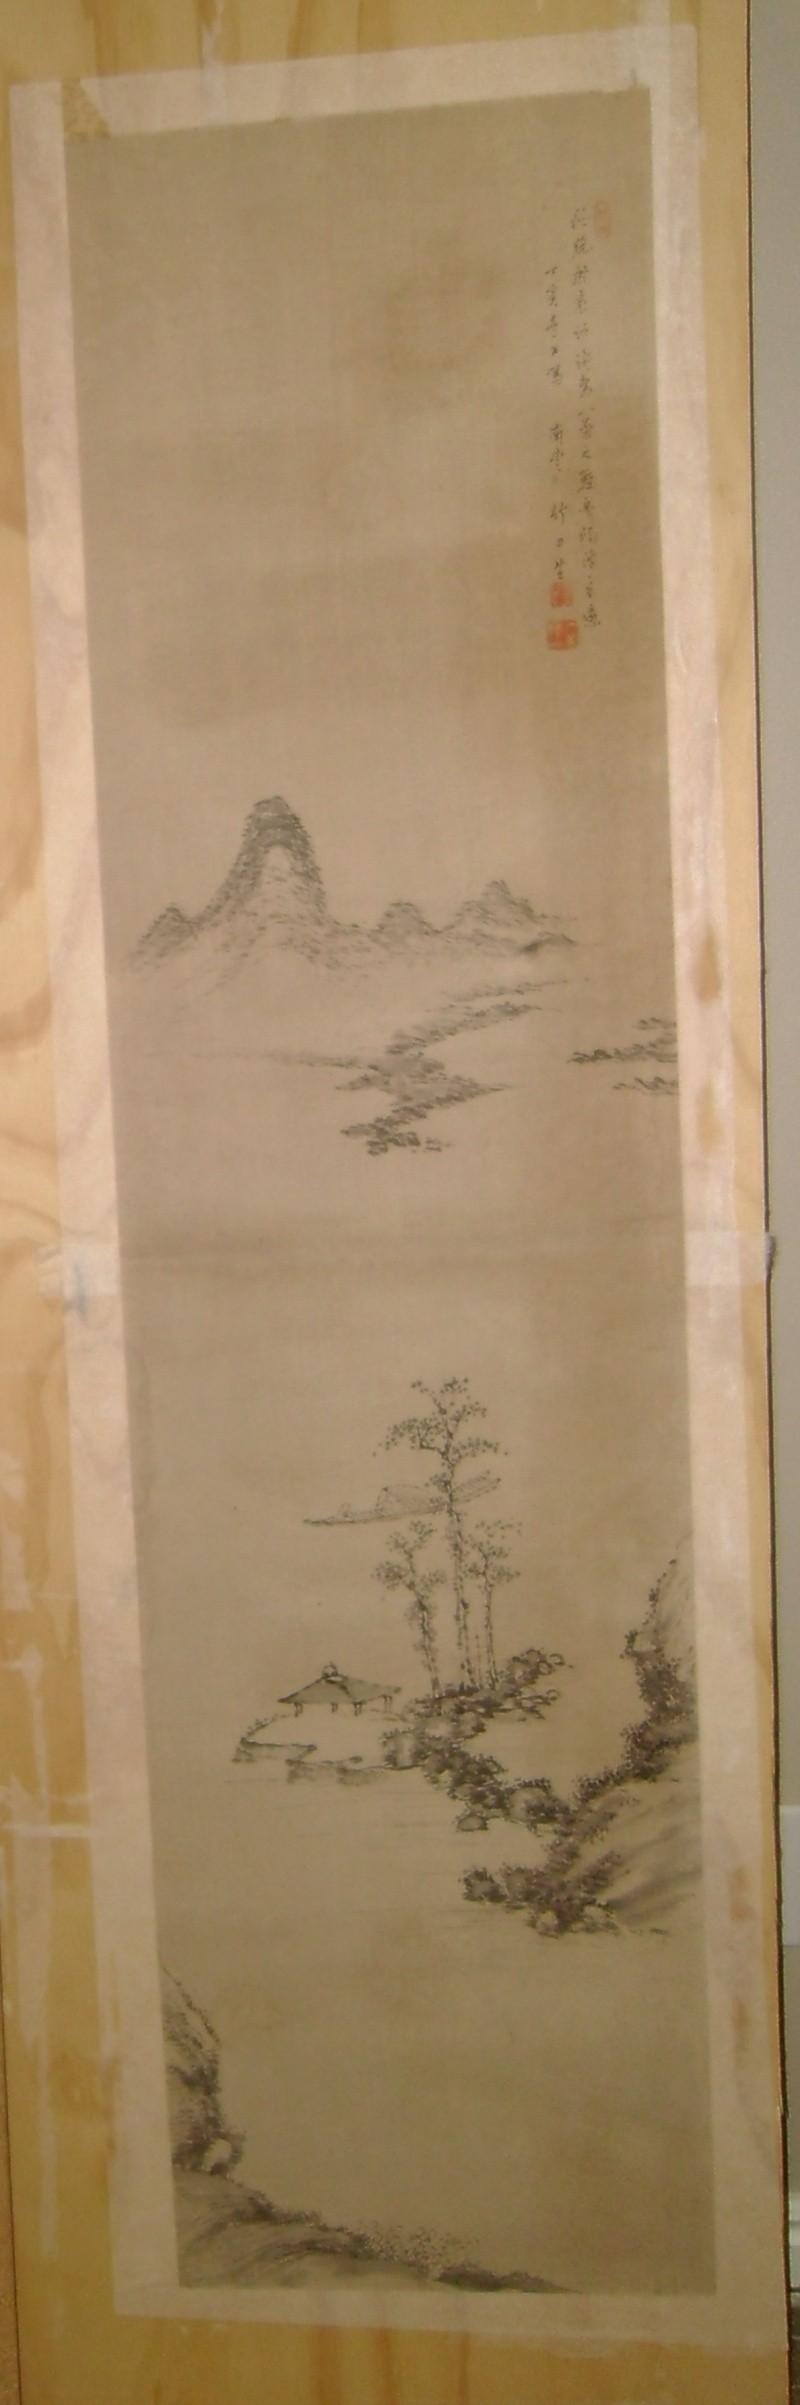 Wall scroll remount 1 & 2 Caoaau10